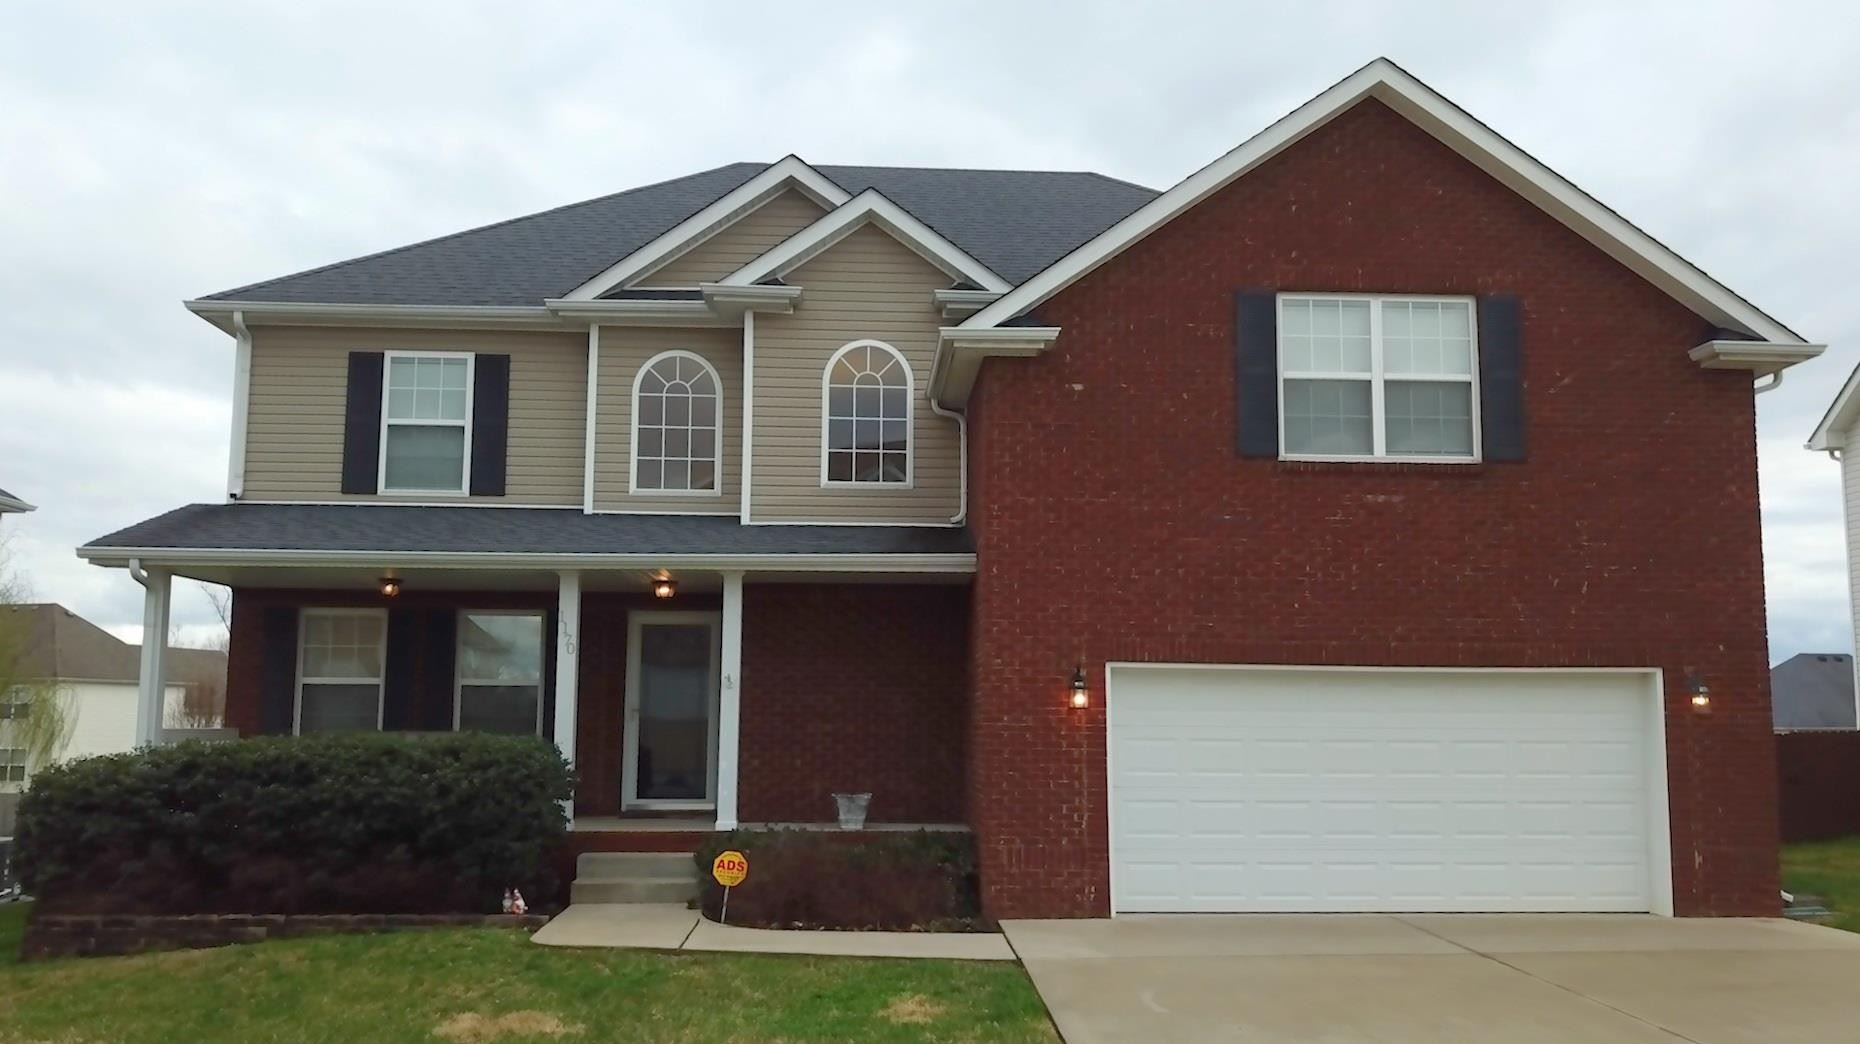 1170 Castlewood Dr, Clarksville, TN 37042 - MLS#: 2250676